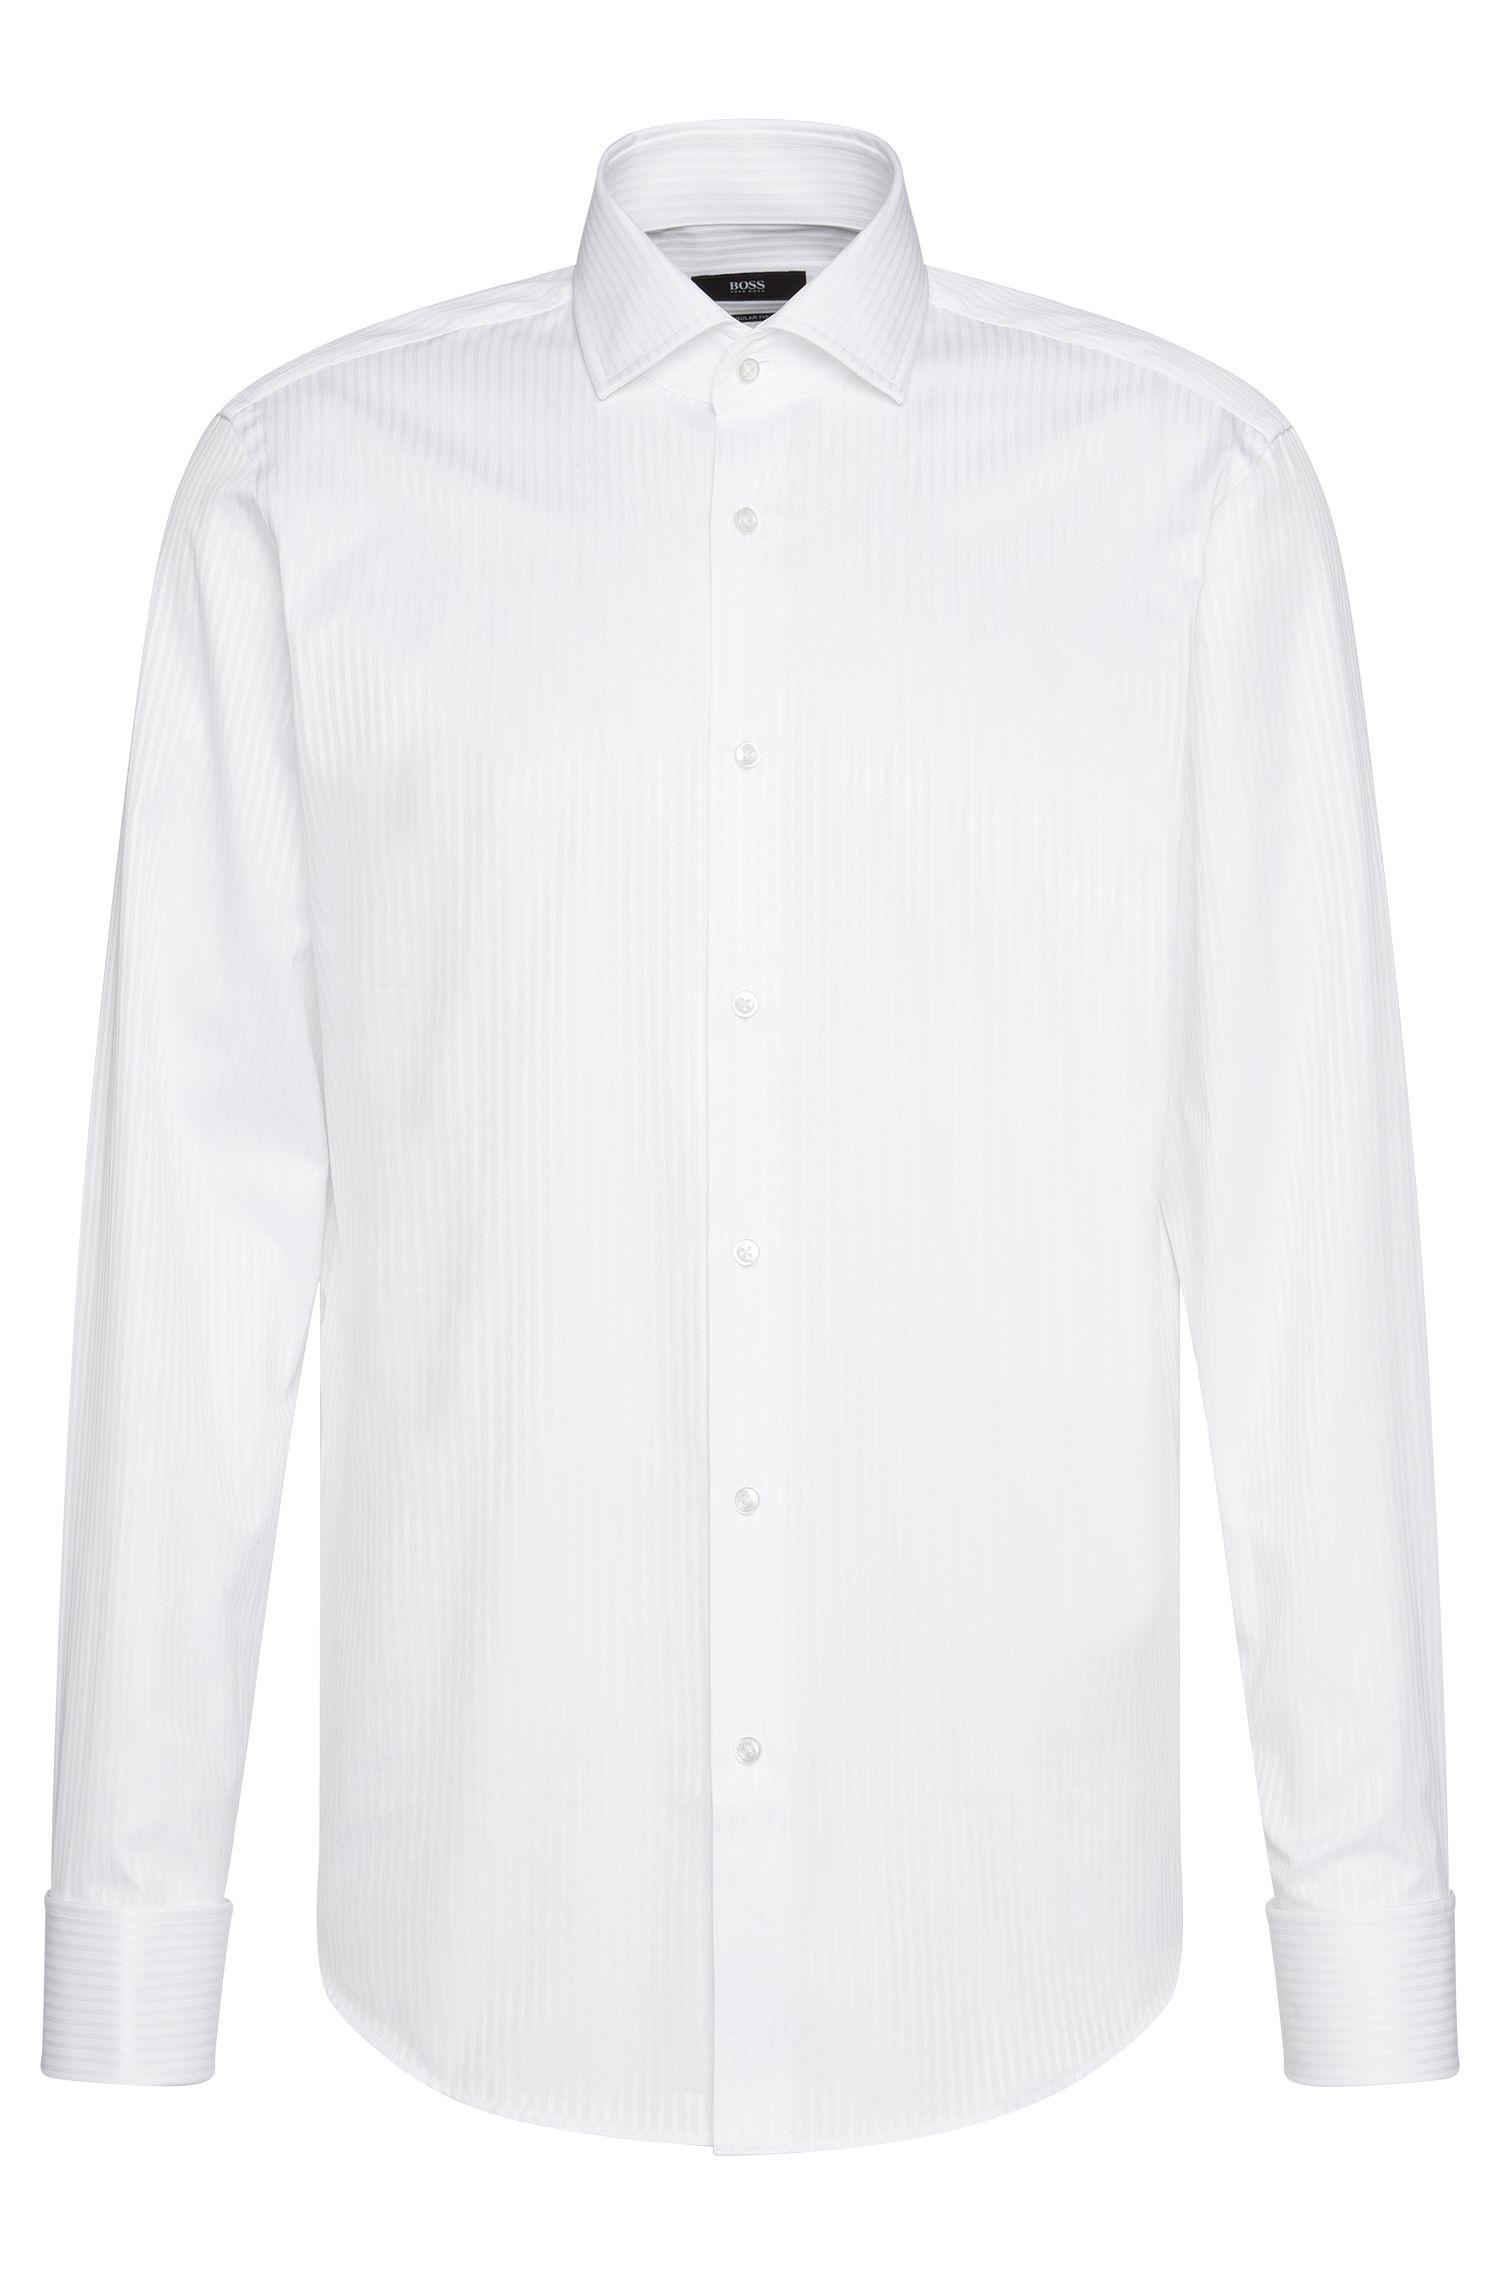 Regular-fit shirt in cotton with turn-back cuffs: 'Gardner'